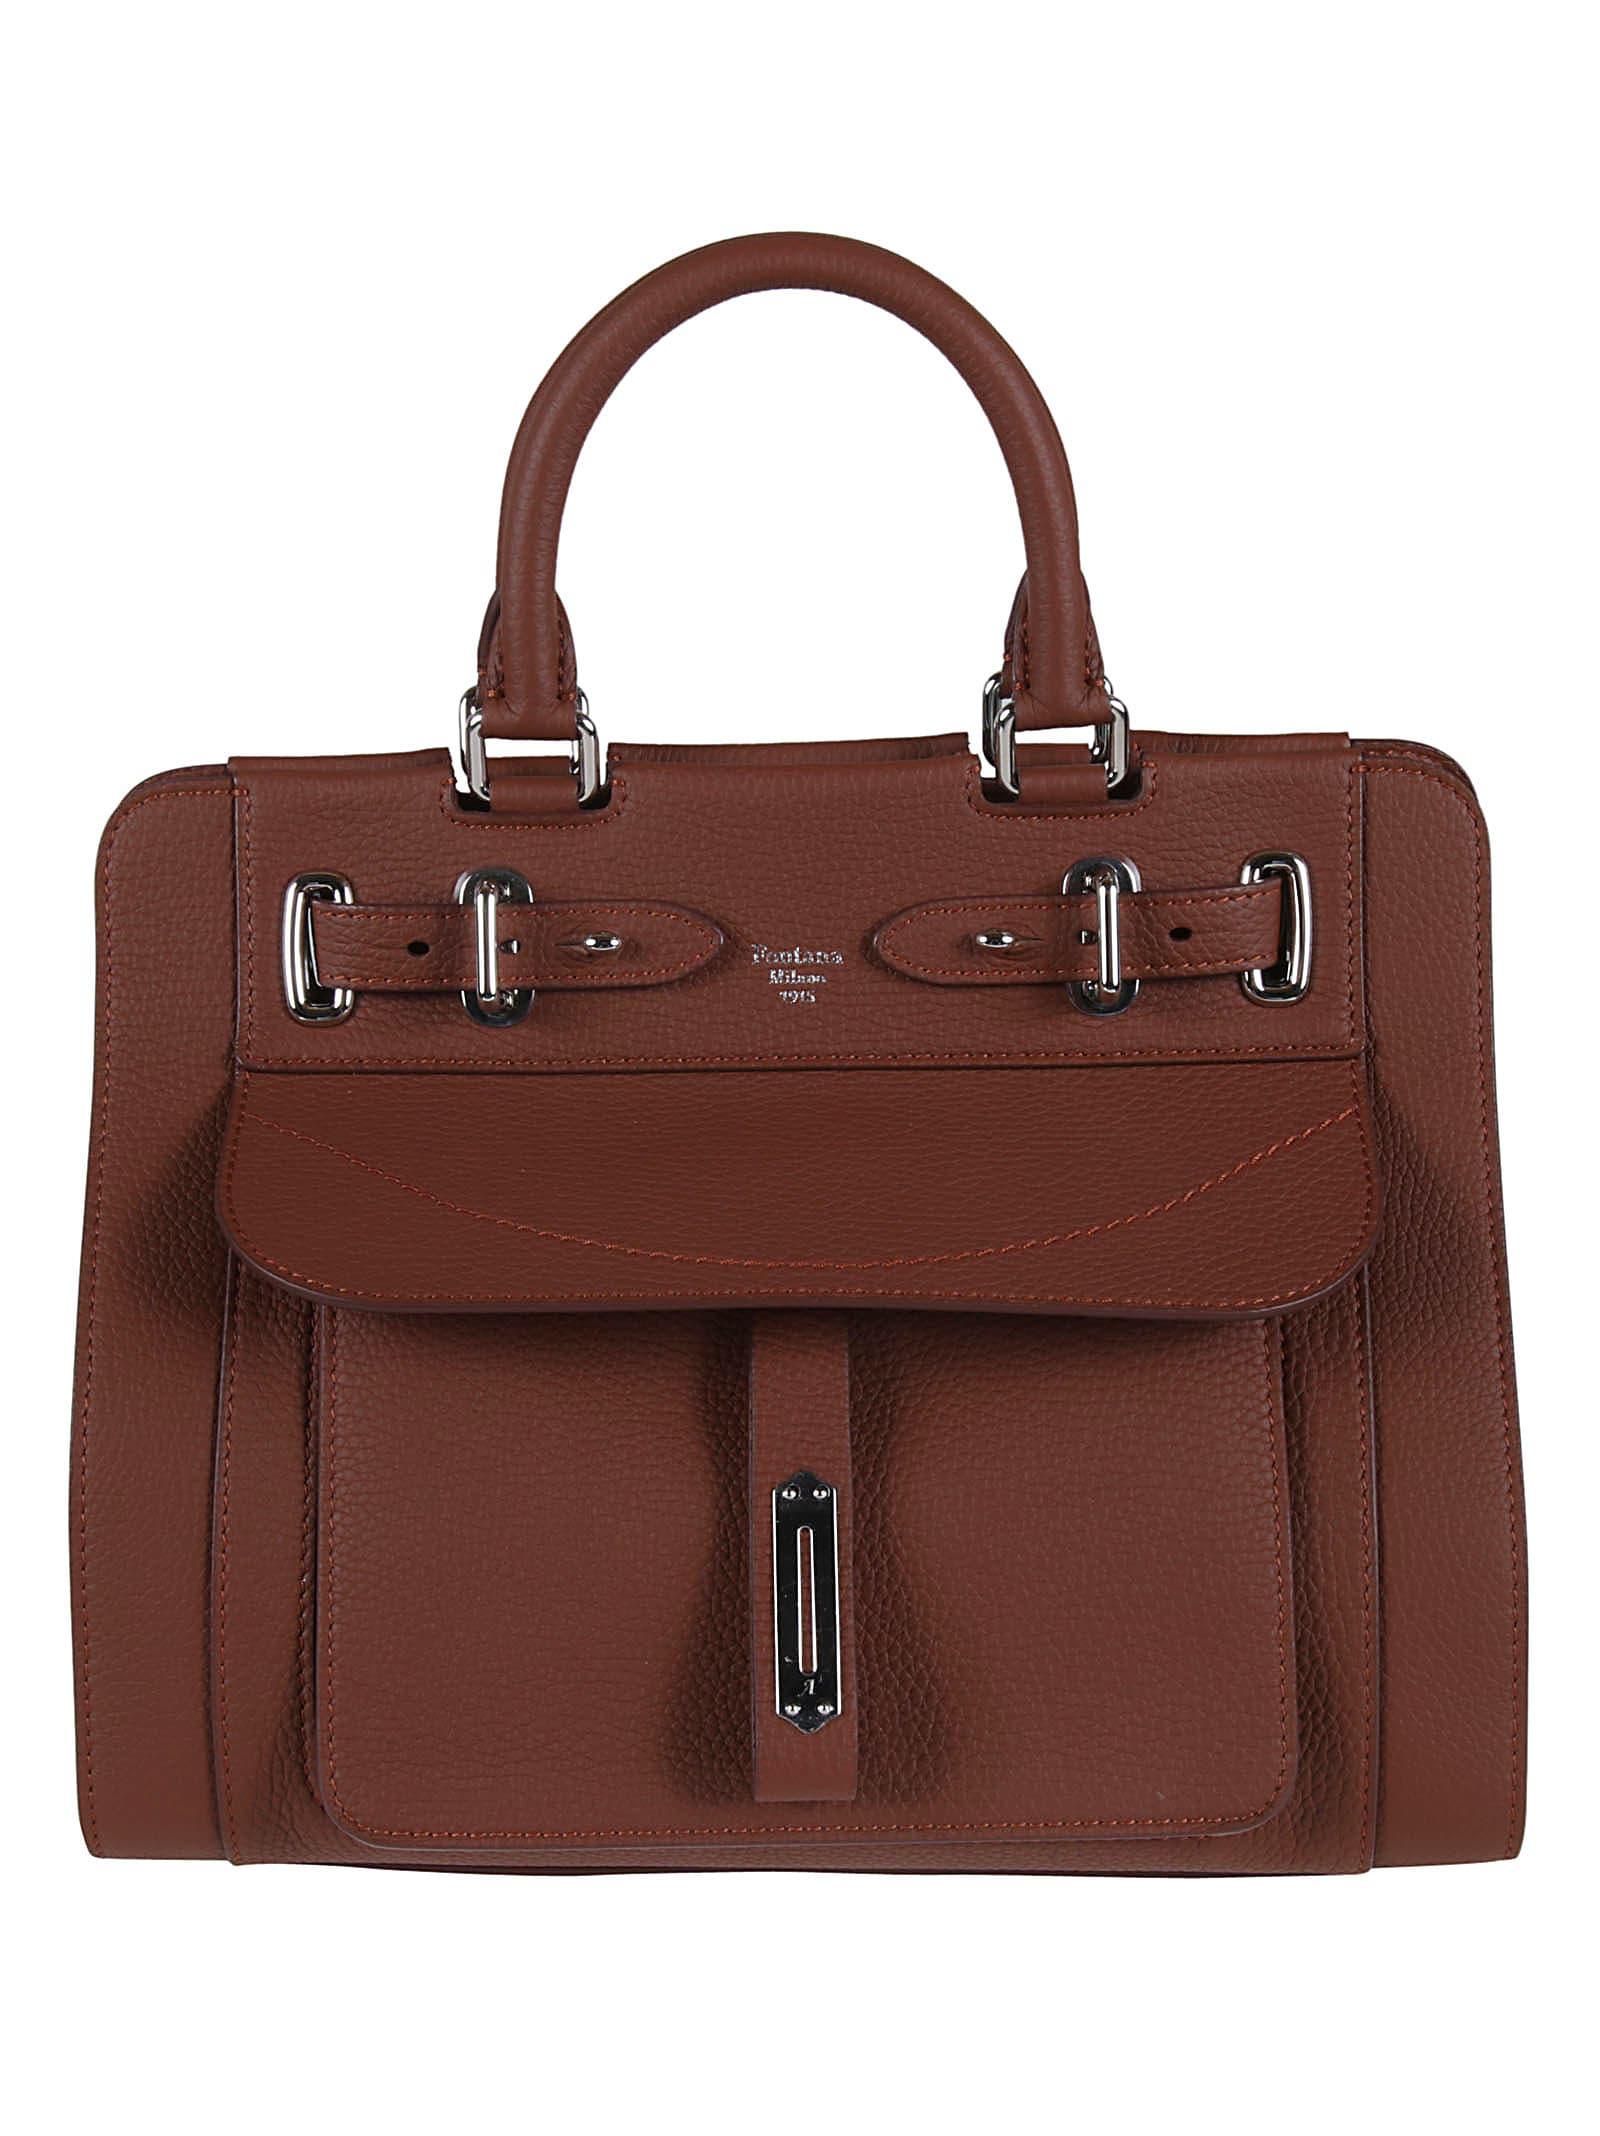 a Lady Bag